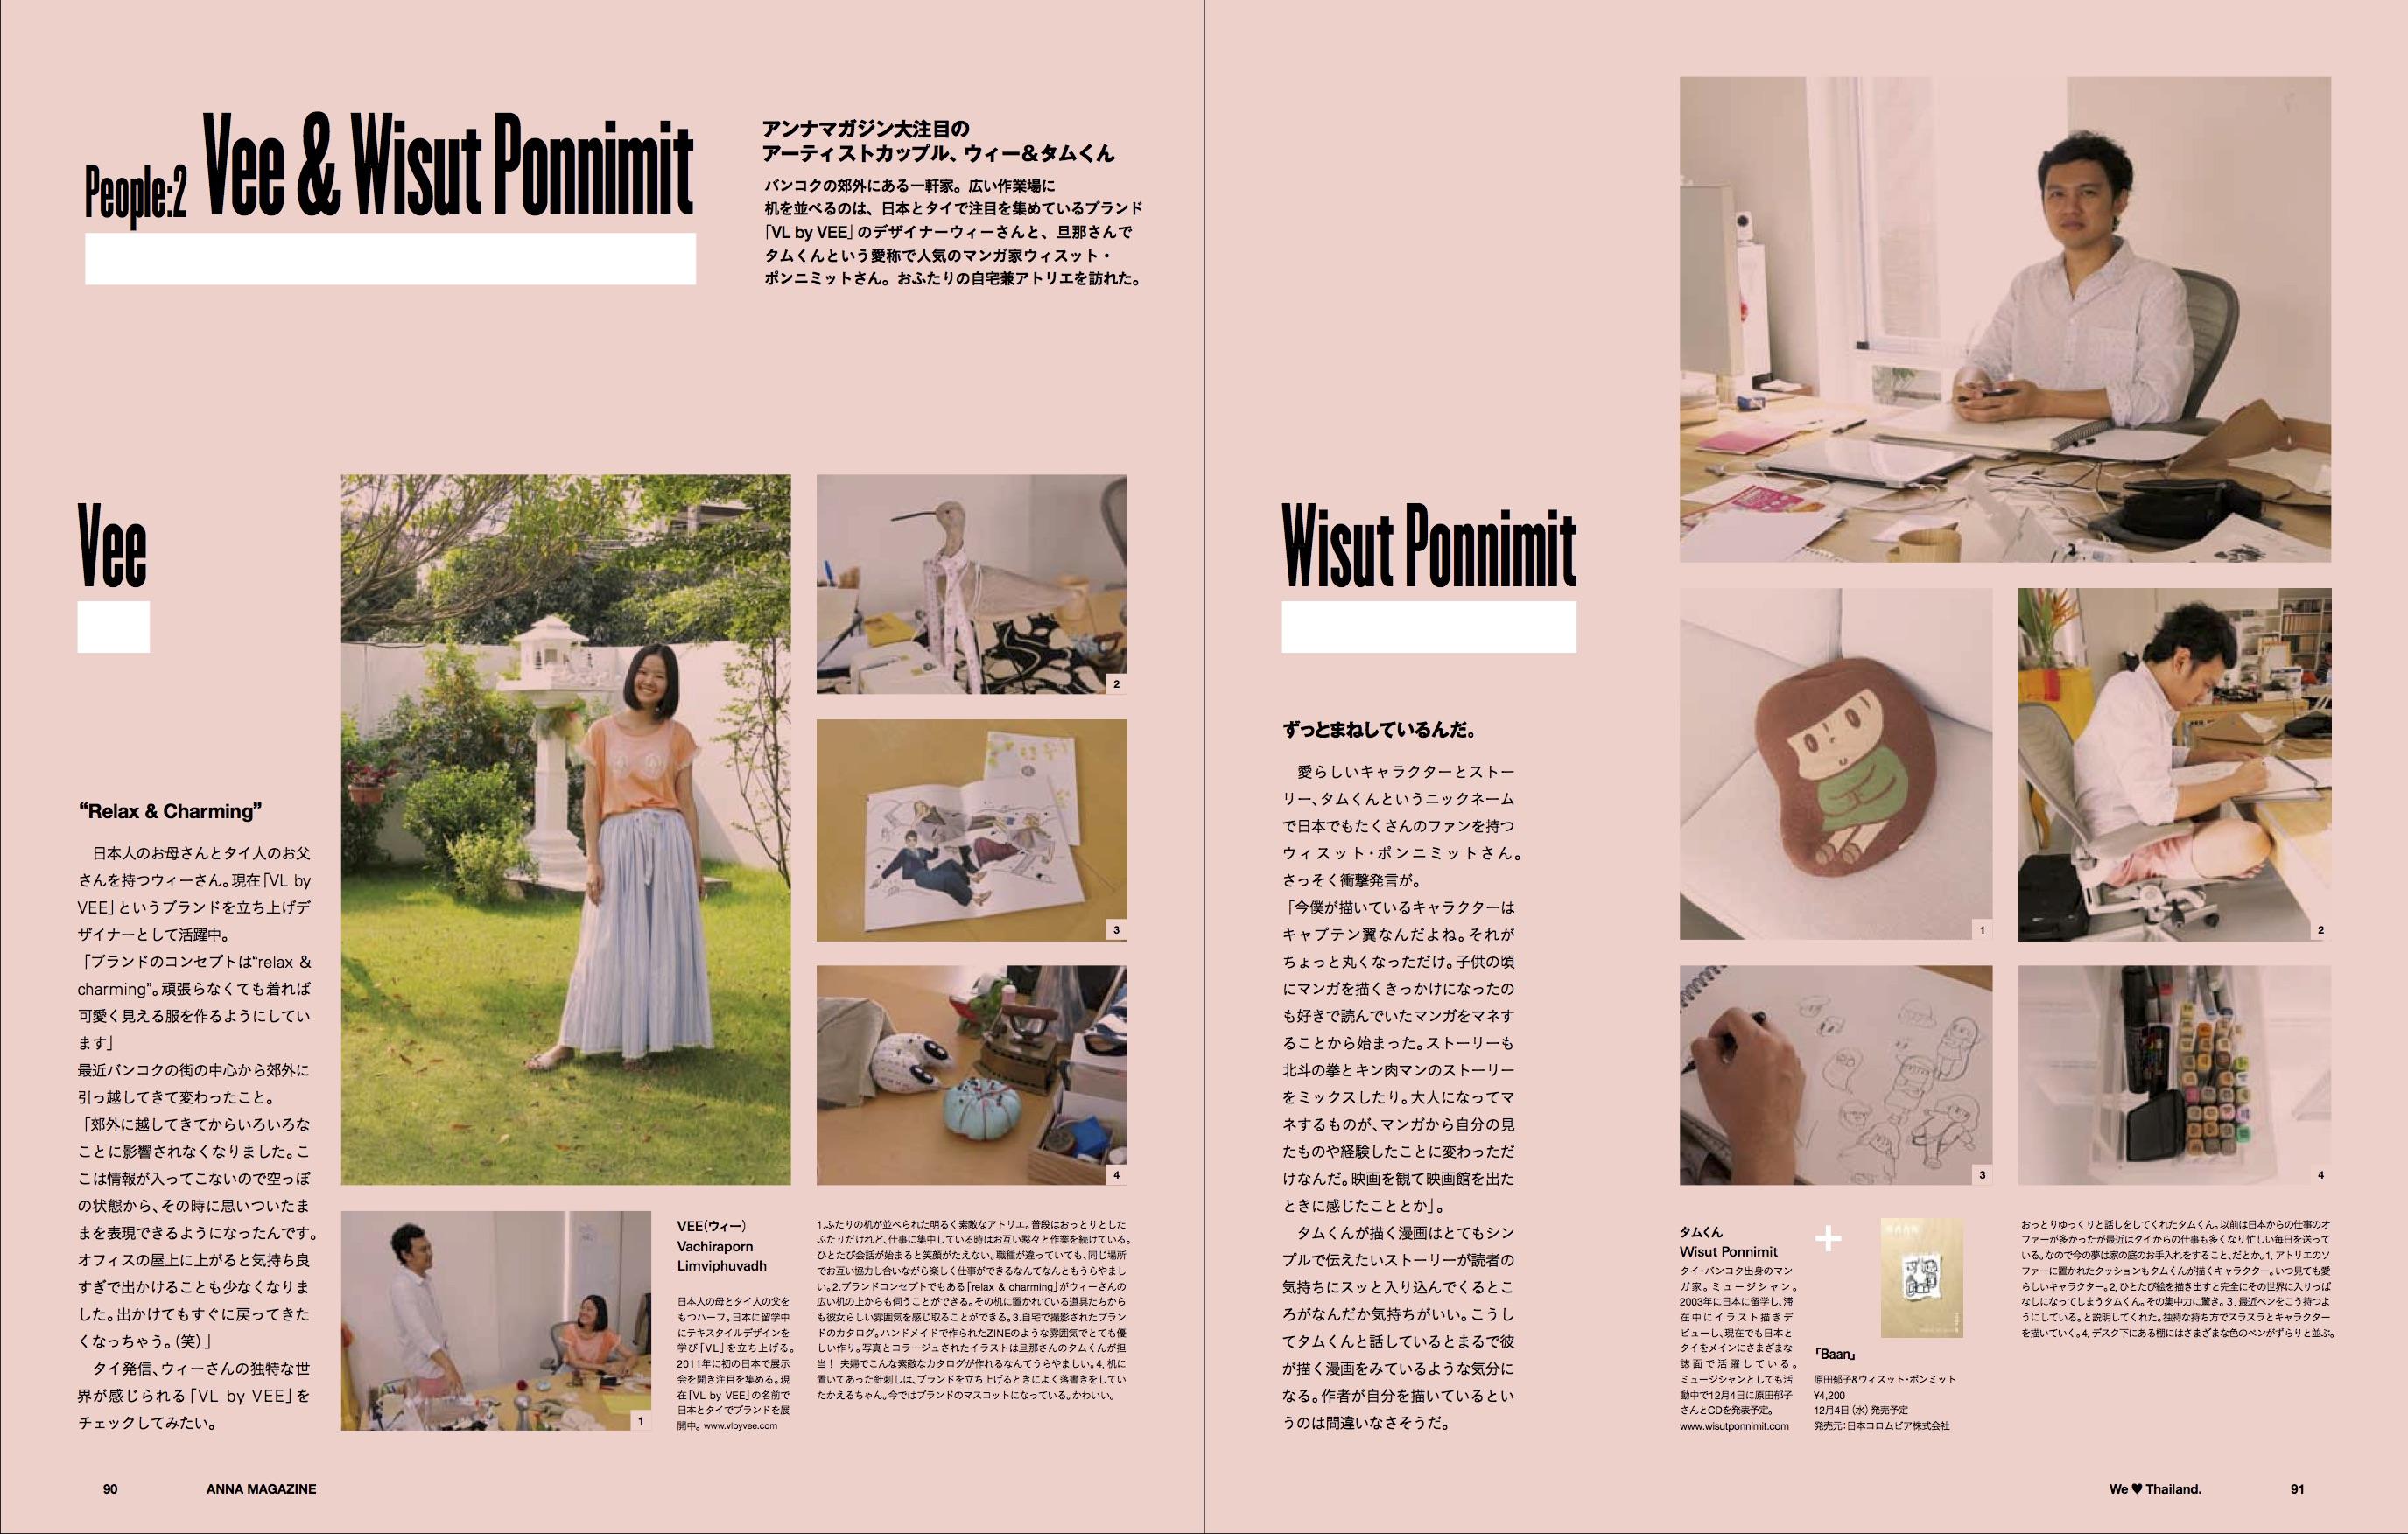 anna magazine Vol.1 P45